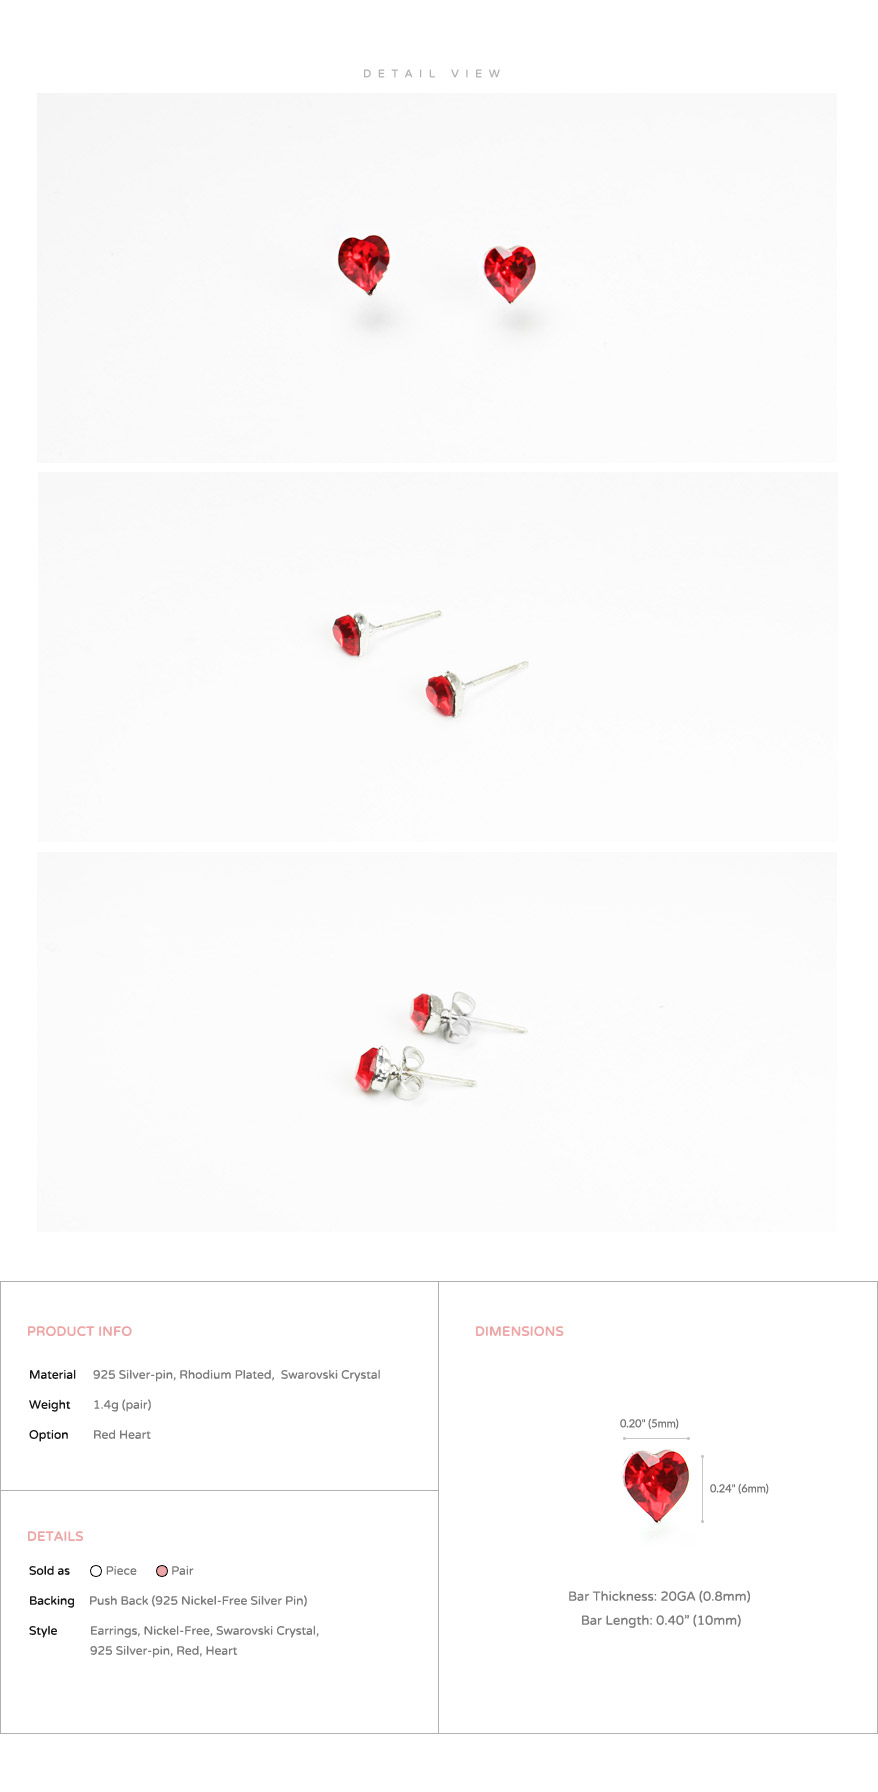 Jewelry_accessories_ear_stud_earrings_korean_asian-style_925-silver_Nickel-Free_Swarovski_Crystal_Rhodium_heart_red_5